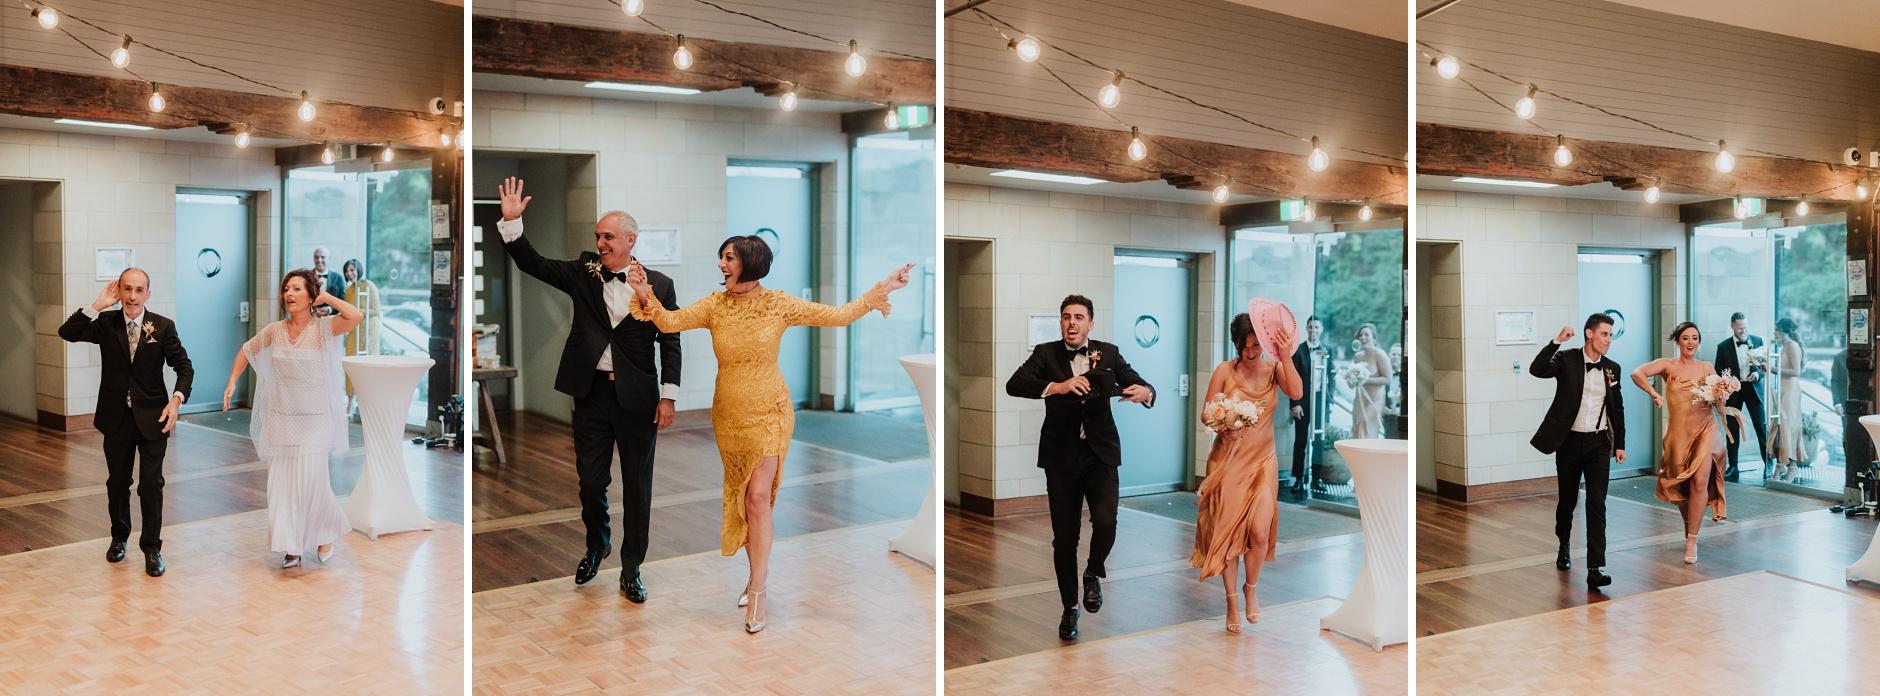 Sydney-Wedding-Photographer_0150.jpg